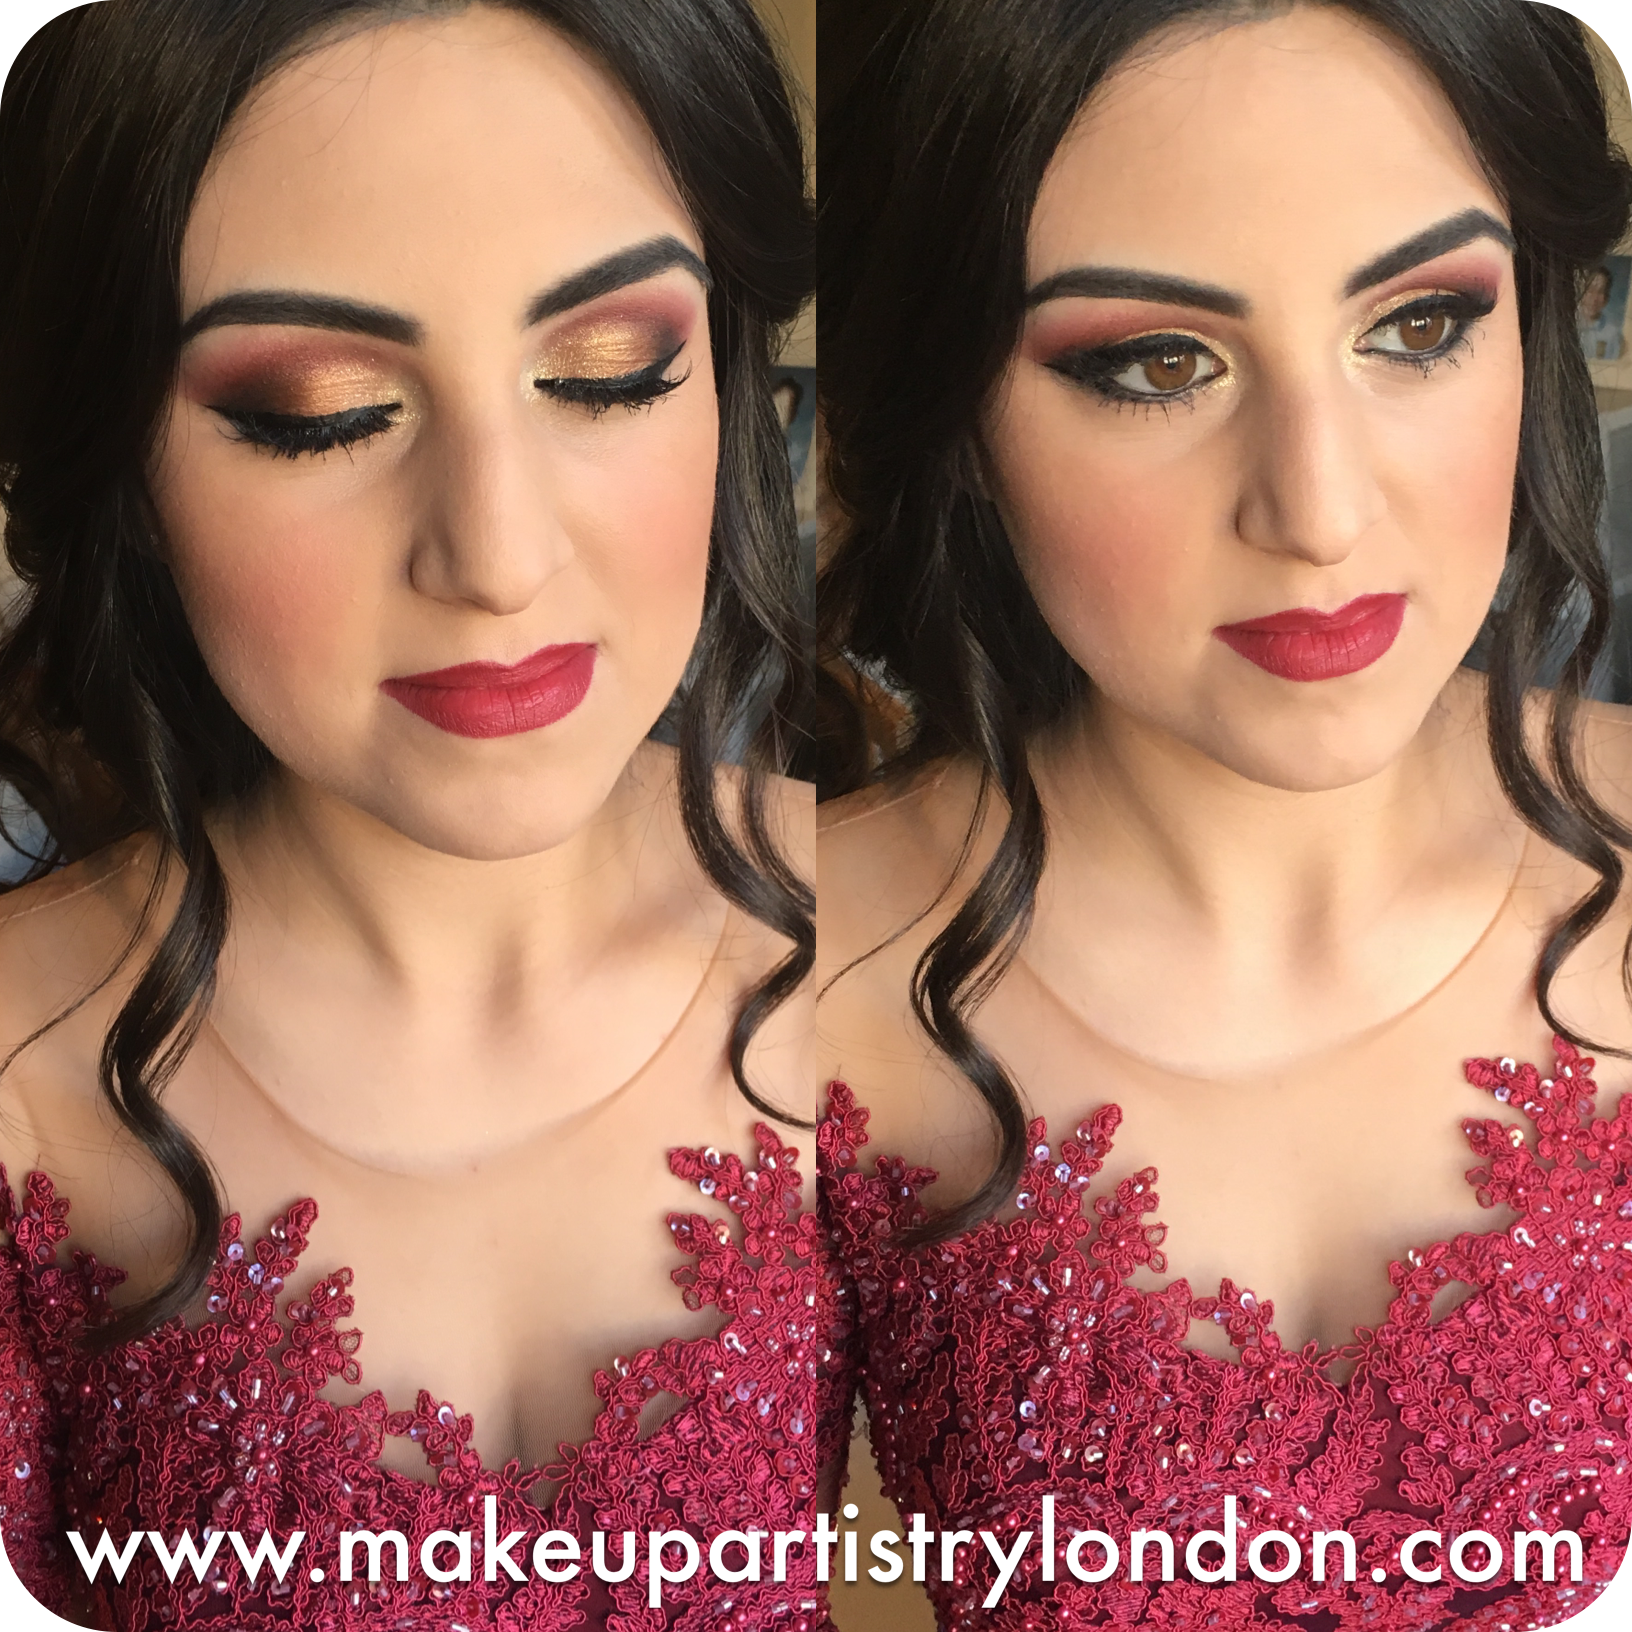 Henna Party London : Turkish bridal make up hd airbrush london